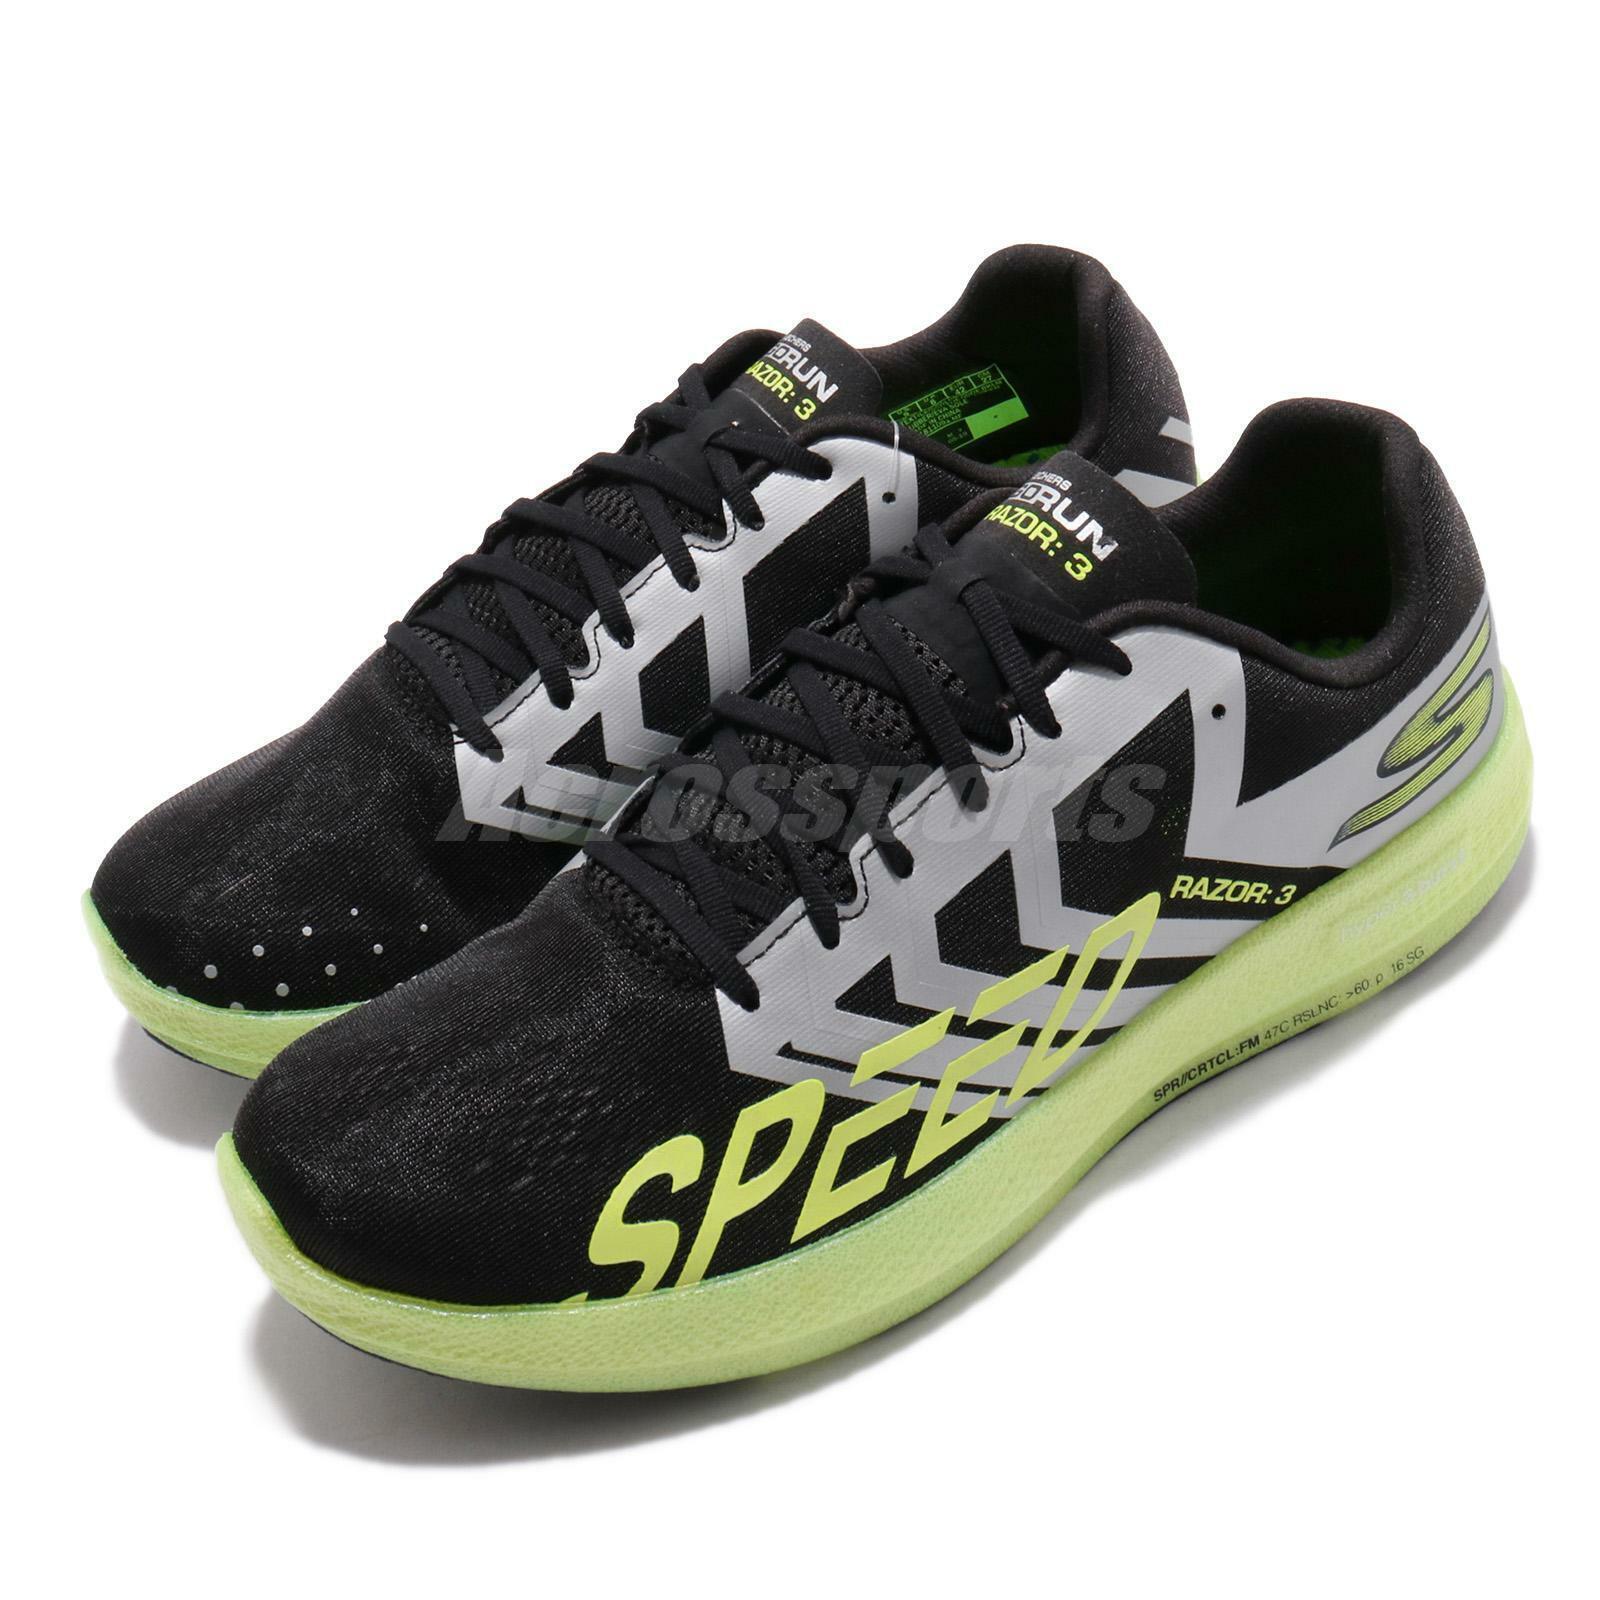 Skechers Razor 3 Negro Plata Go Run Cal Hombre Running Zapatos TENIS 55220-BKLM